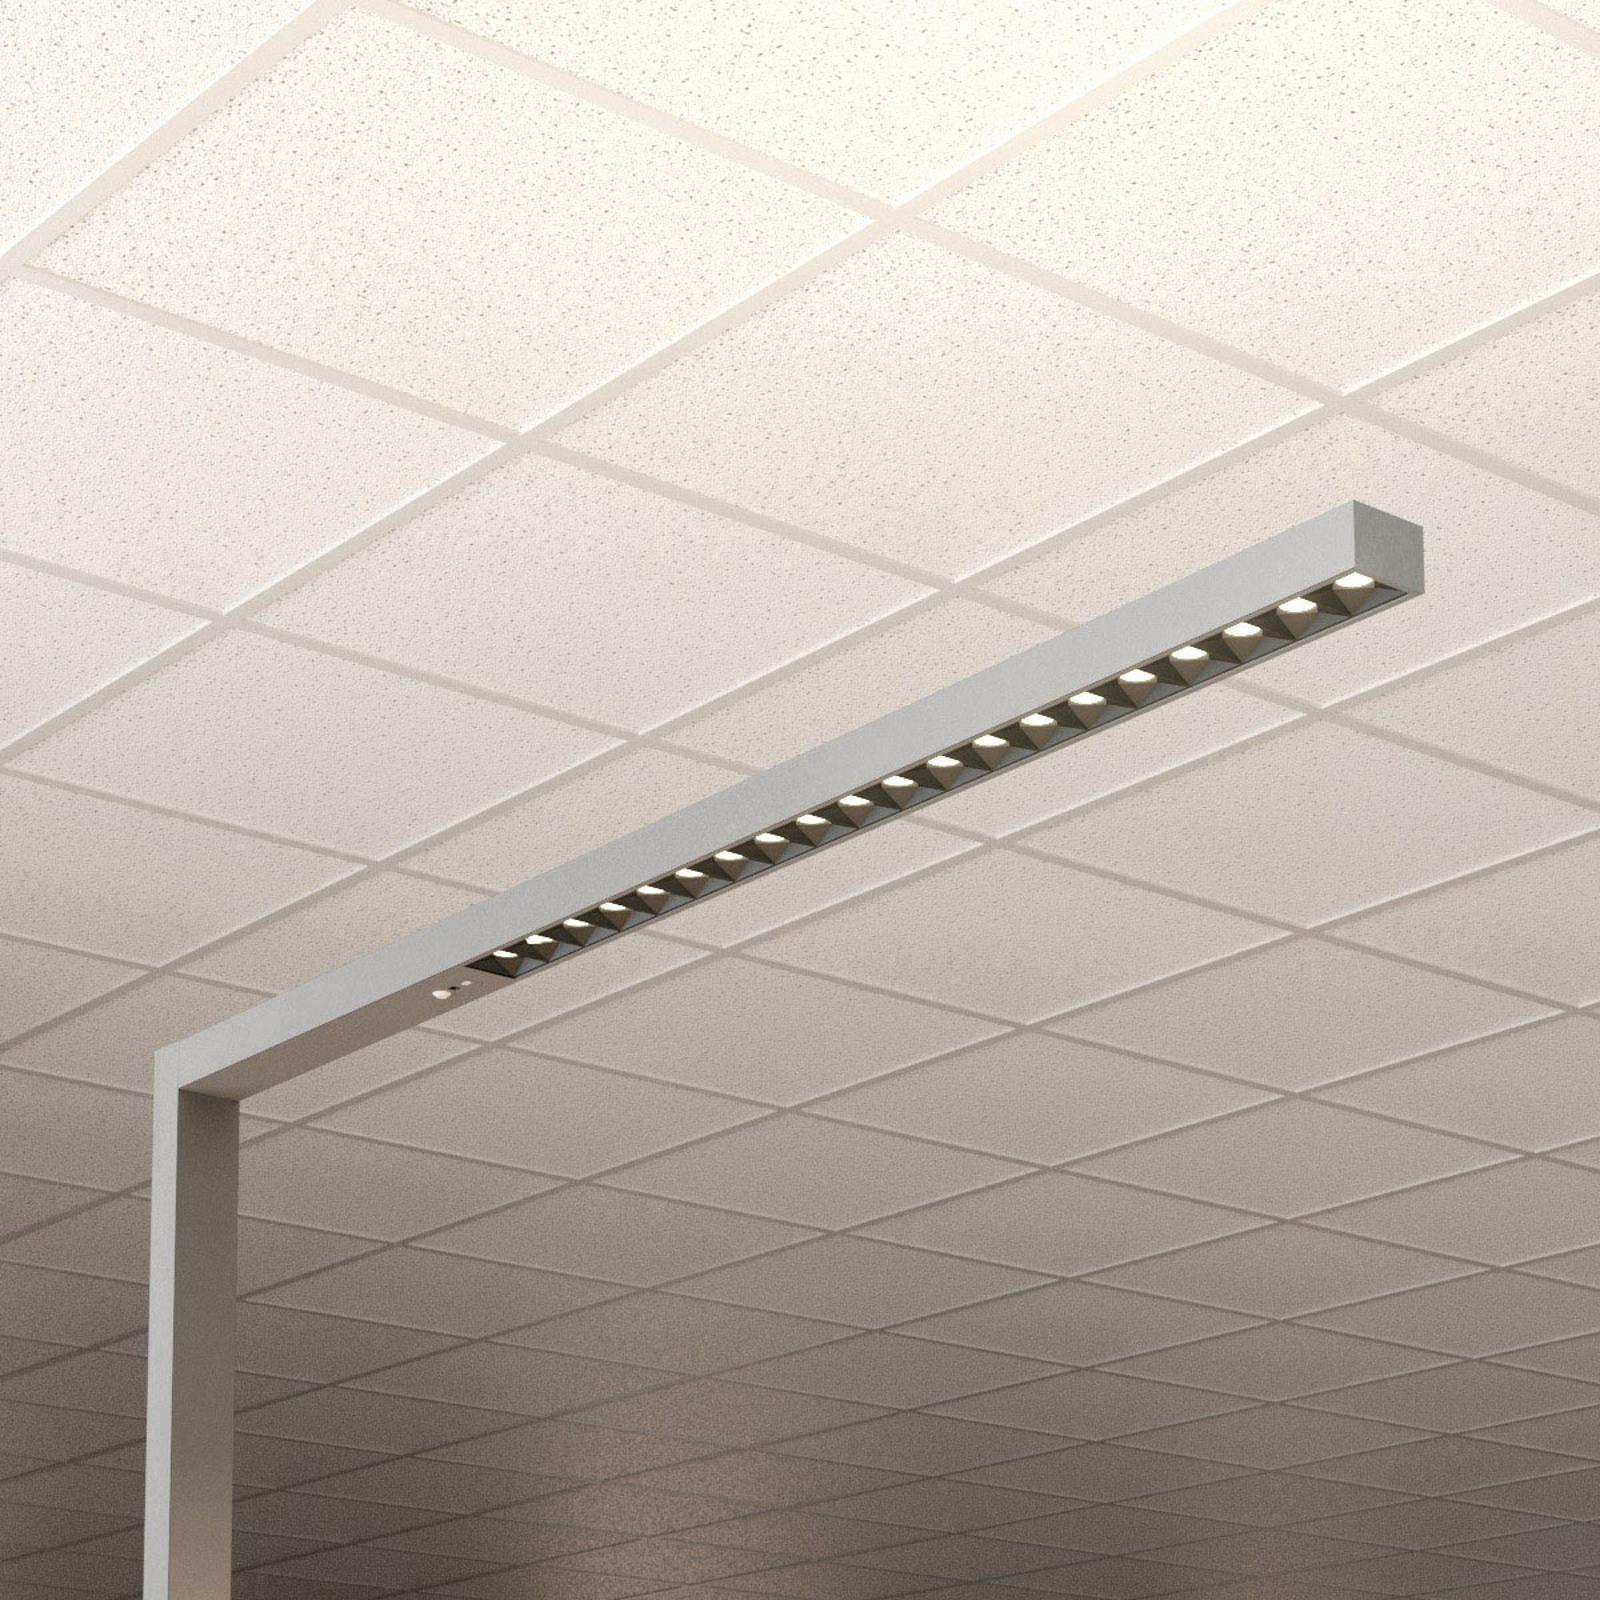 Lampa stojąca biurowa LED Laris srebrna 3000-6000K